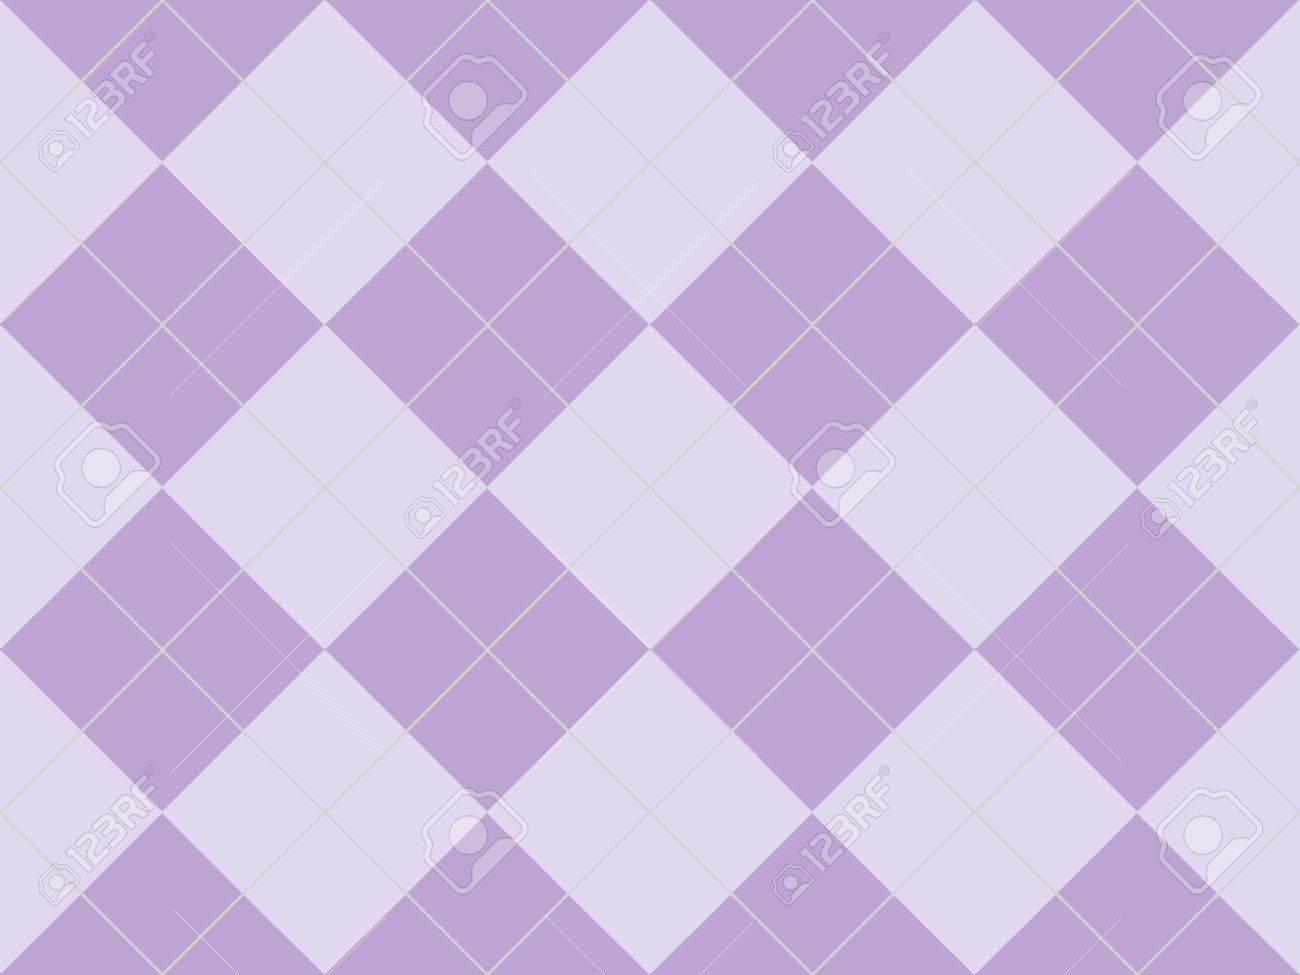 Seamless argyle pattern with purple rhombuses Stock Photo - 8801994